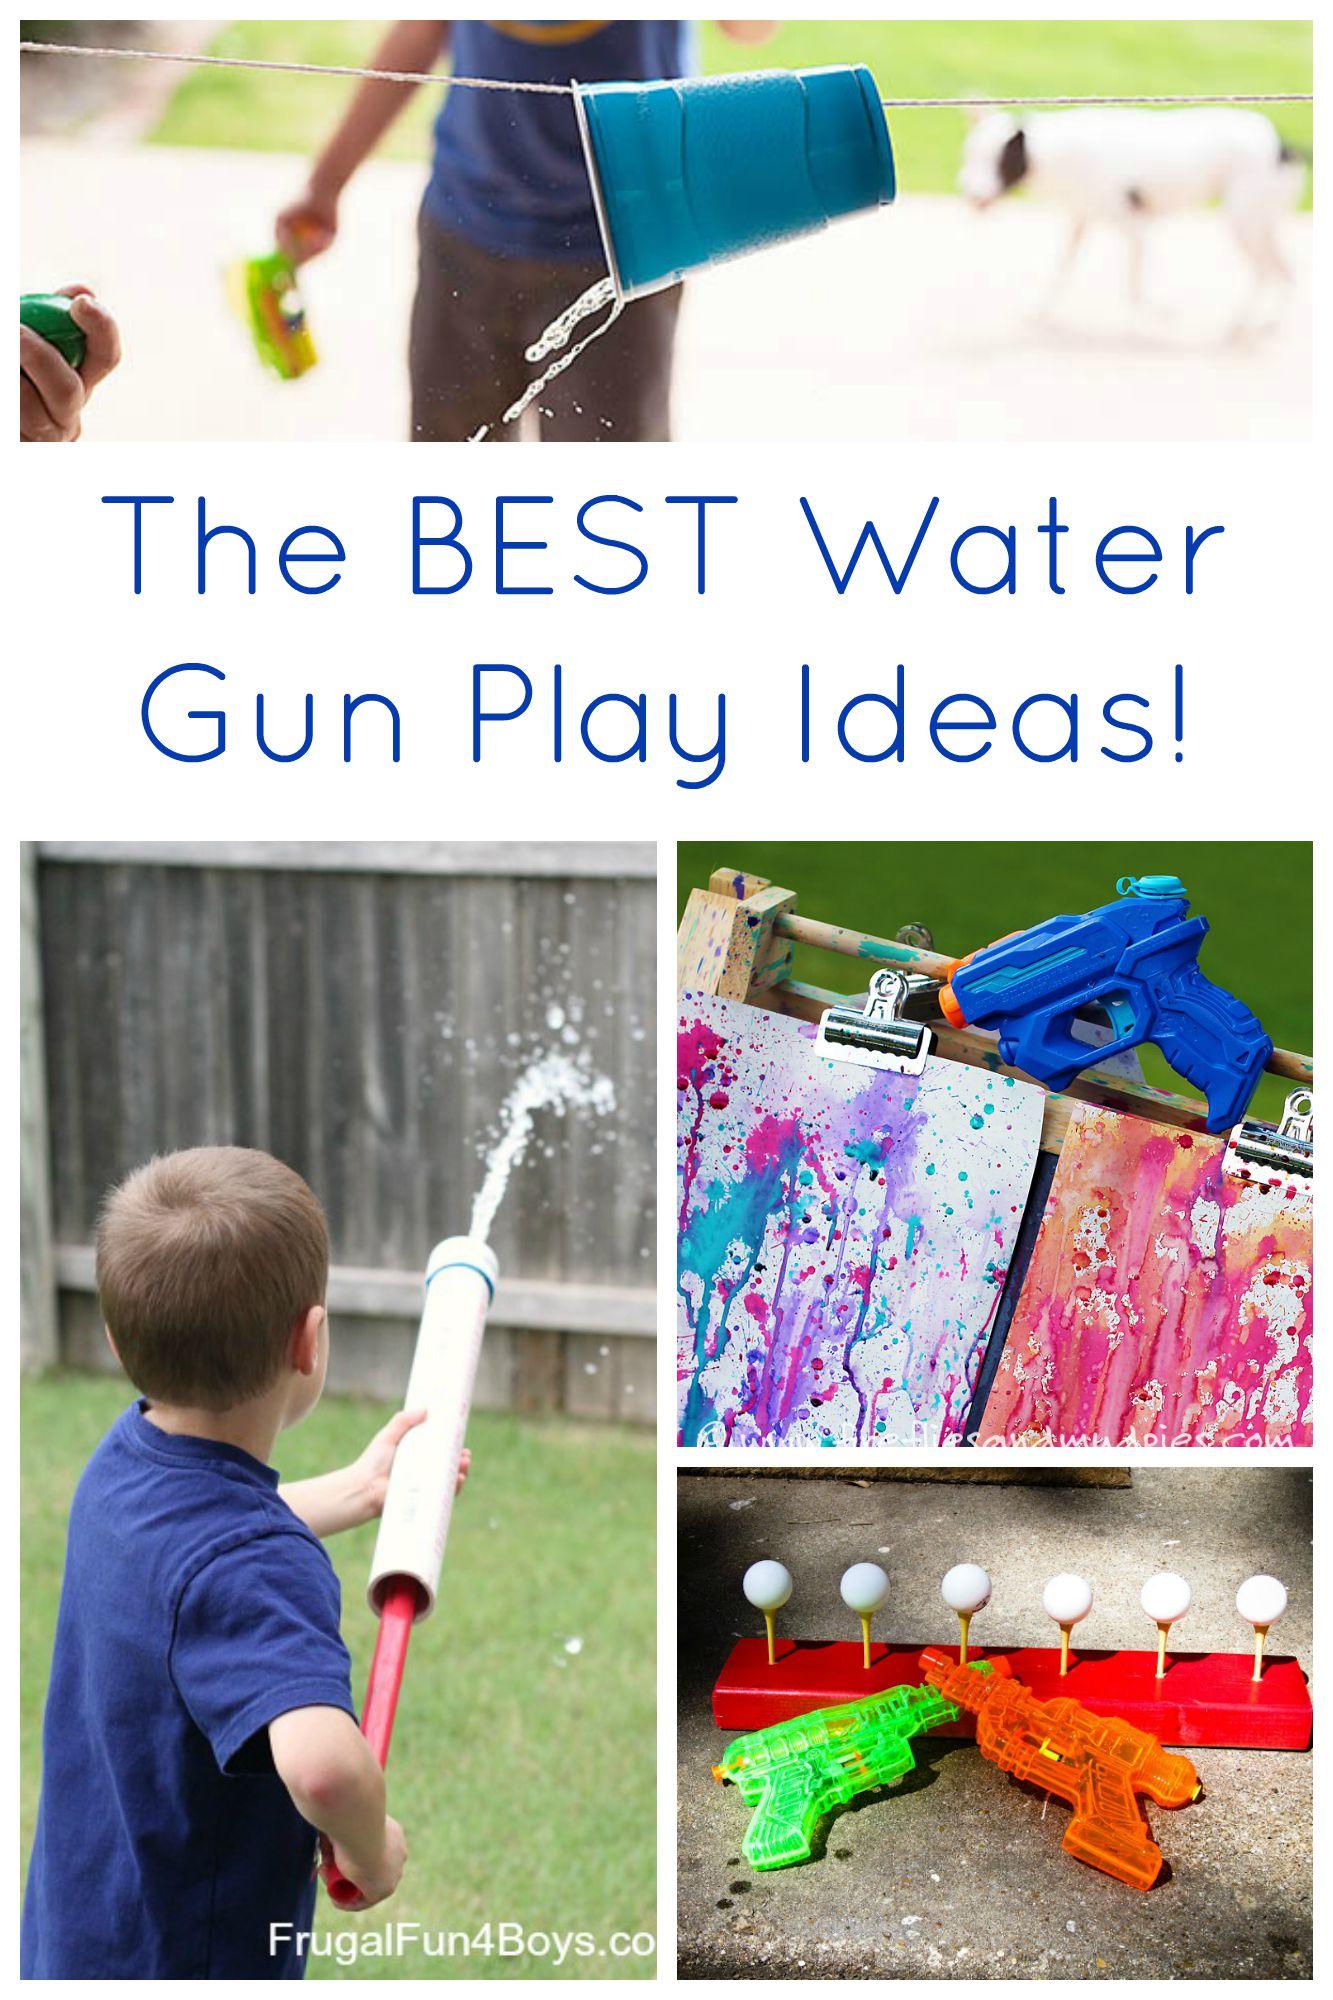 The BEST Water Gun Play Ideas for Kids!